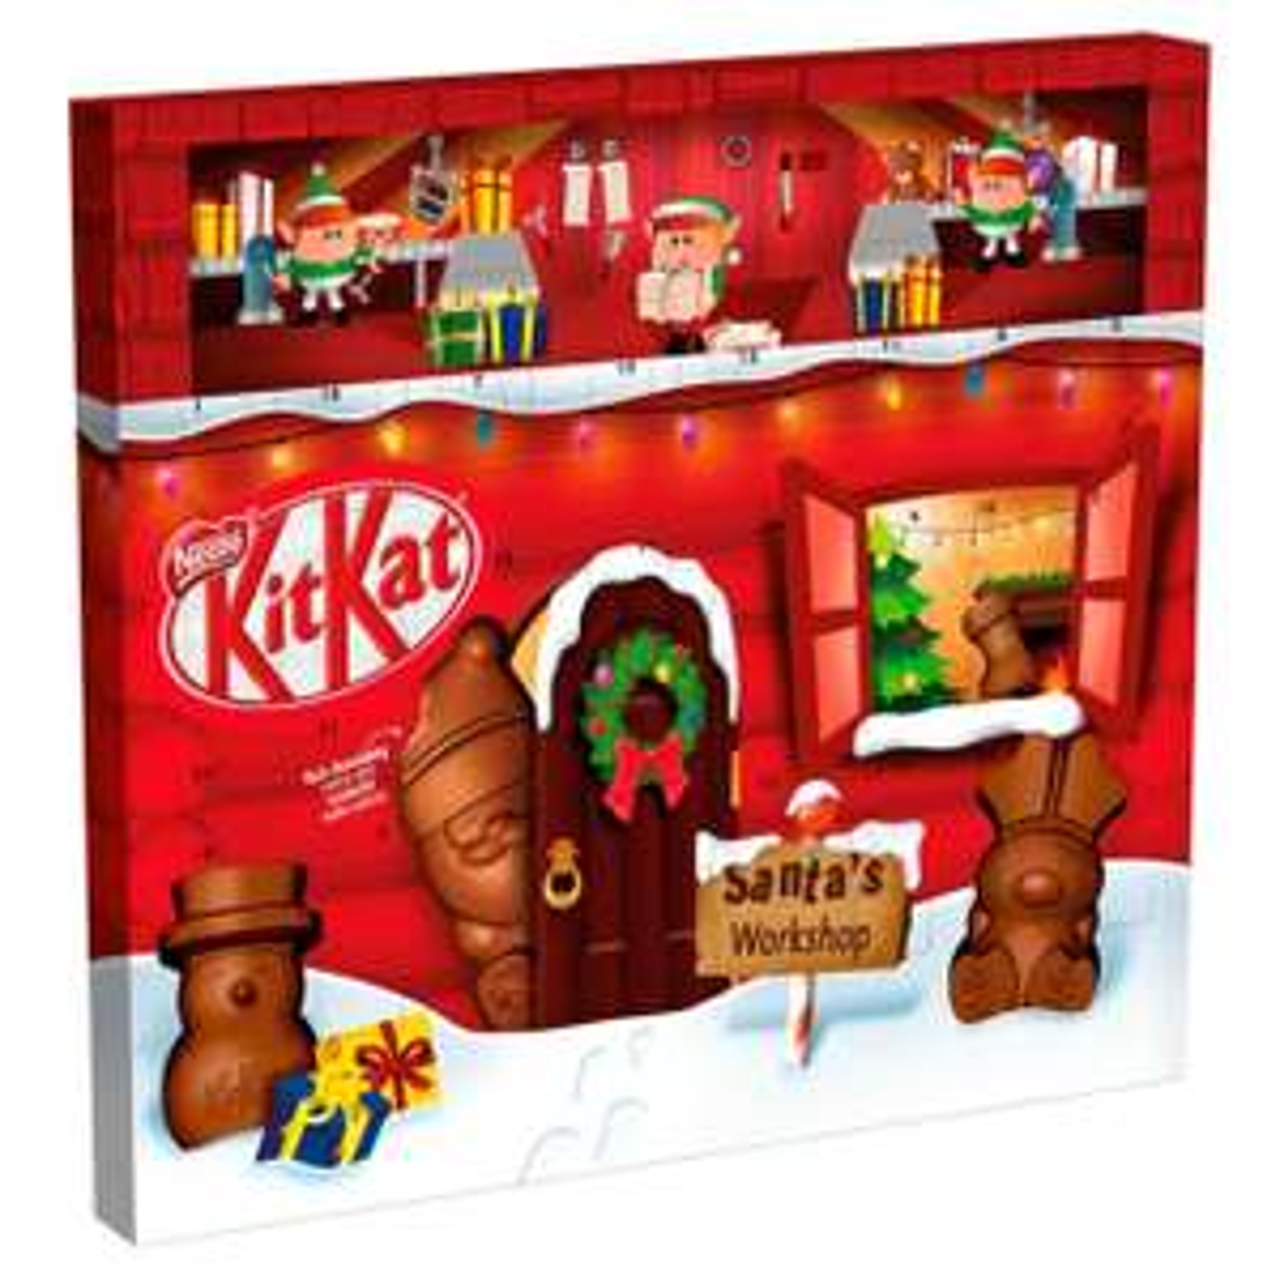 Nestle Kitkat Santa Milk Chocolate Advent Calendar 195g - £3.00 @ Tesco